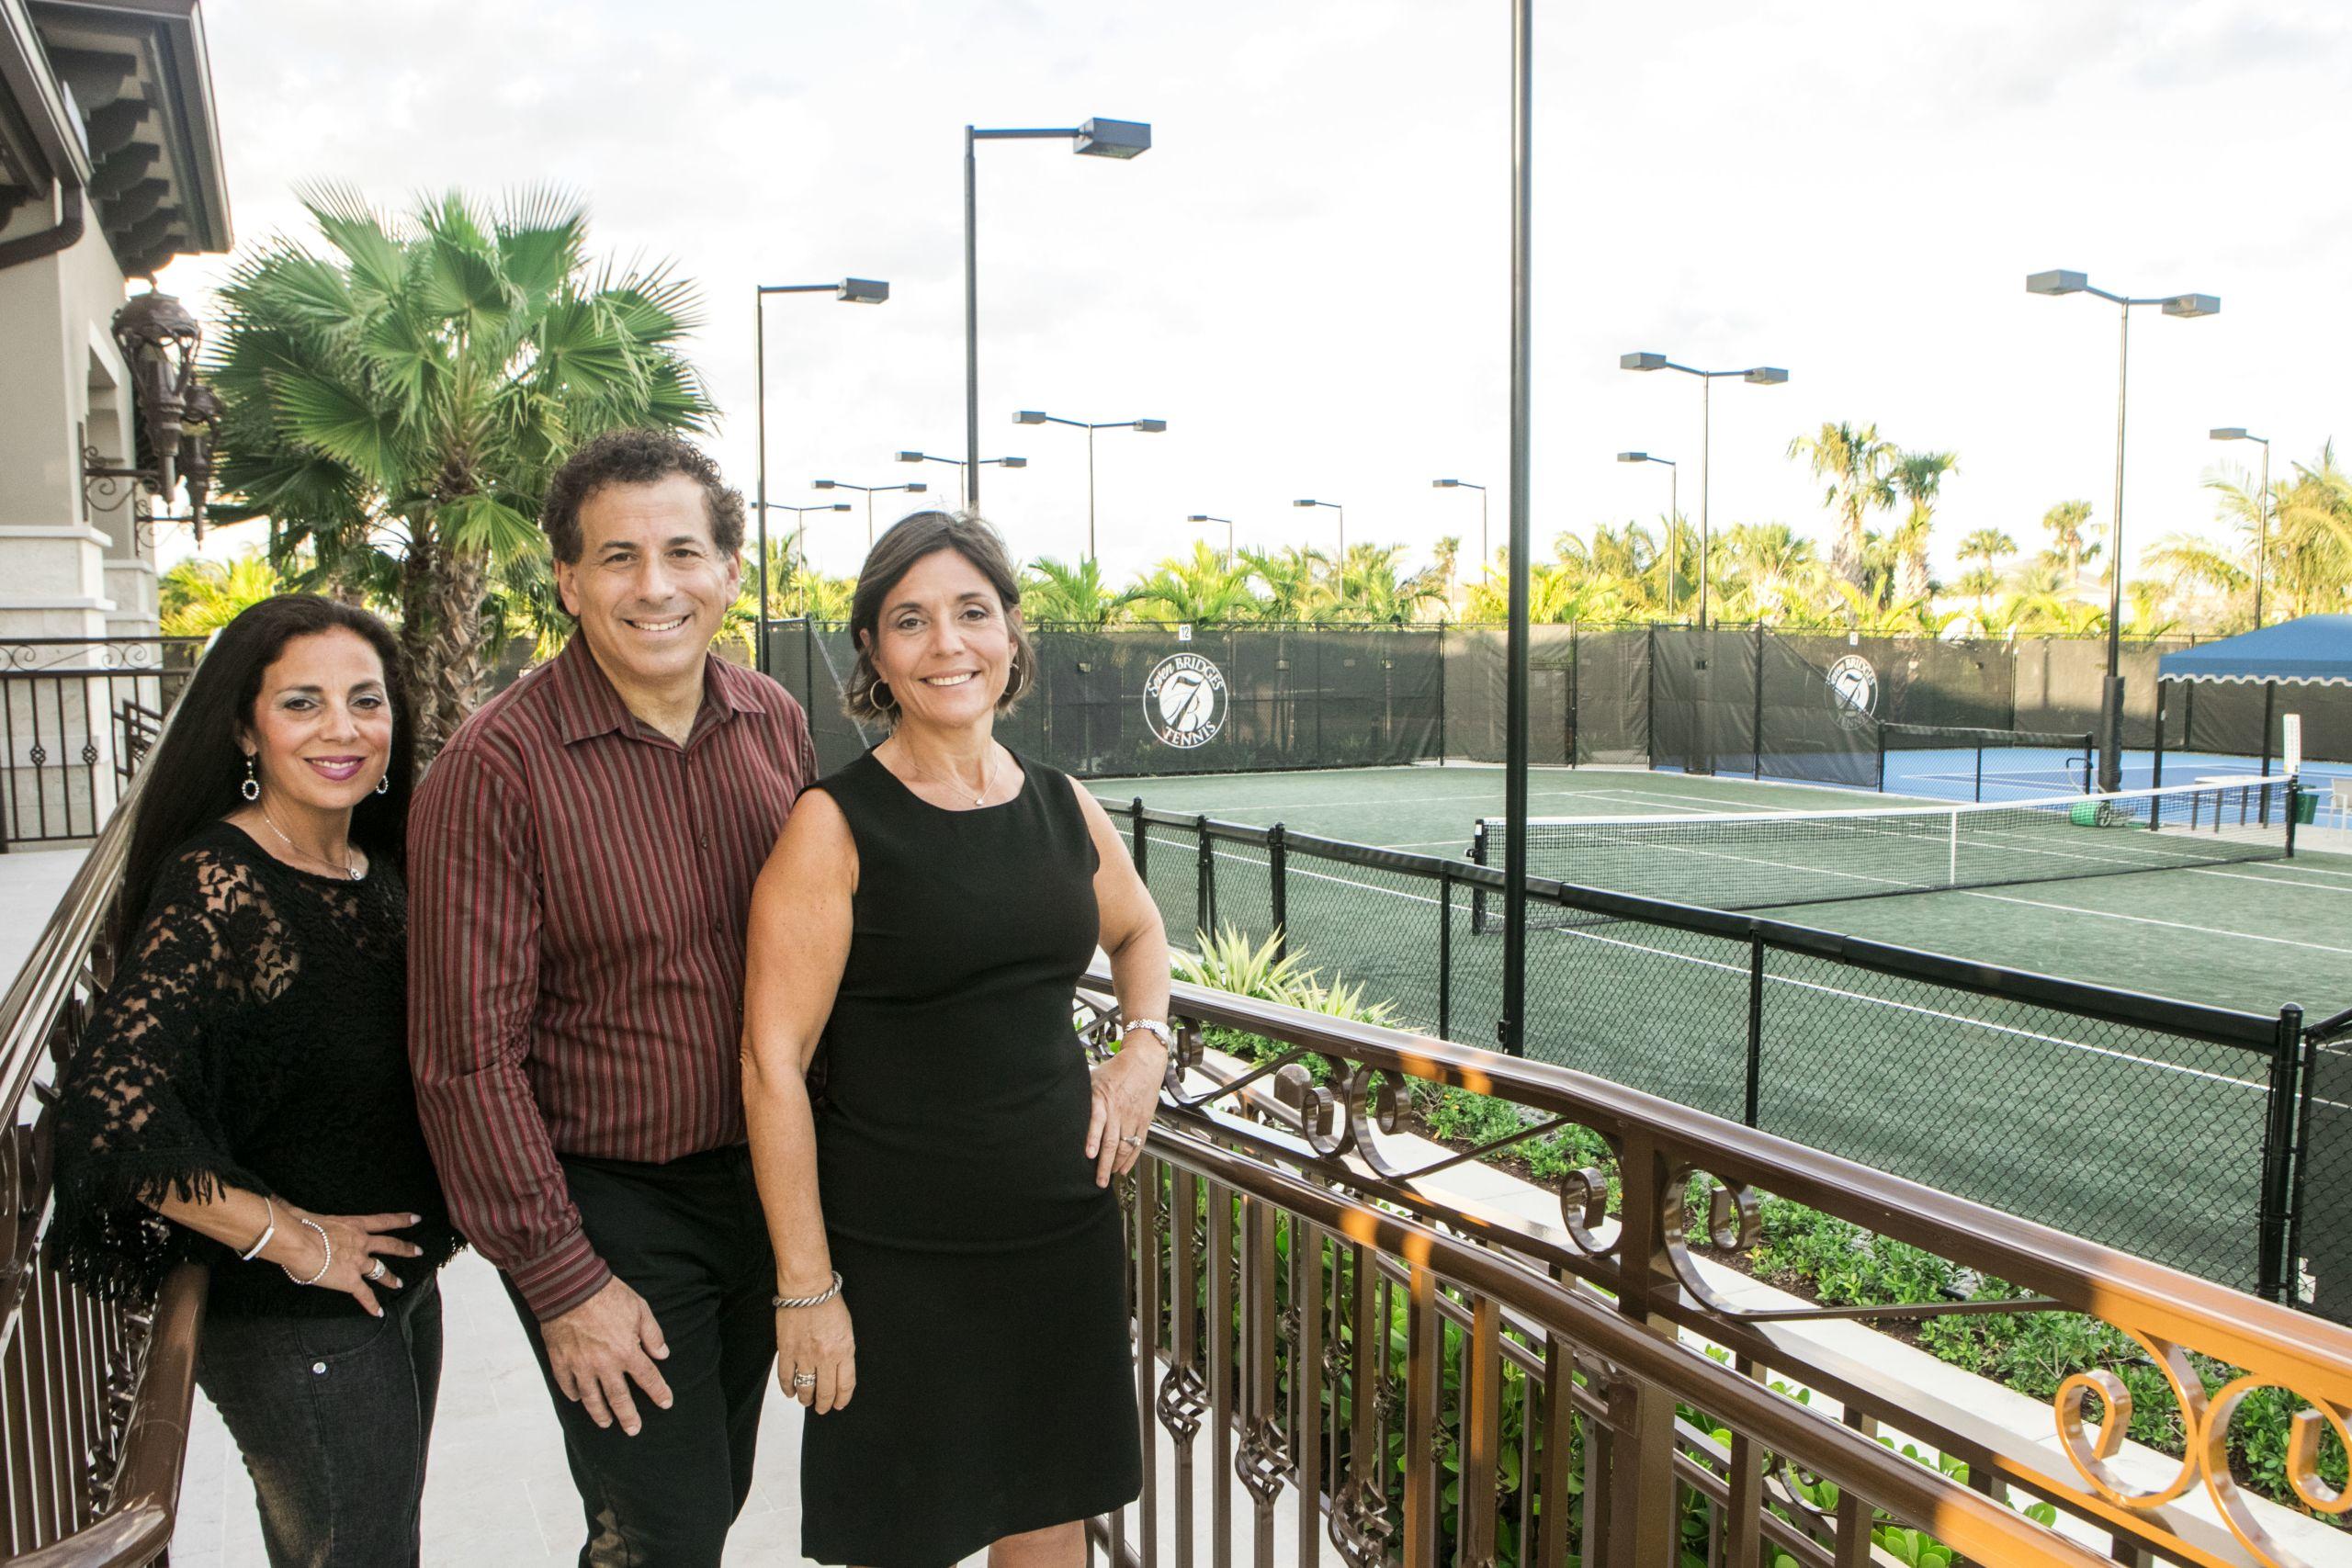 Plenty Of Tennis Courts In Both Communities